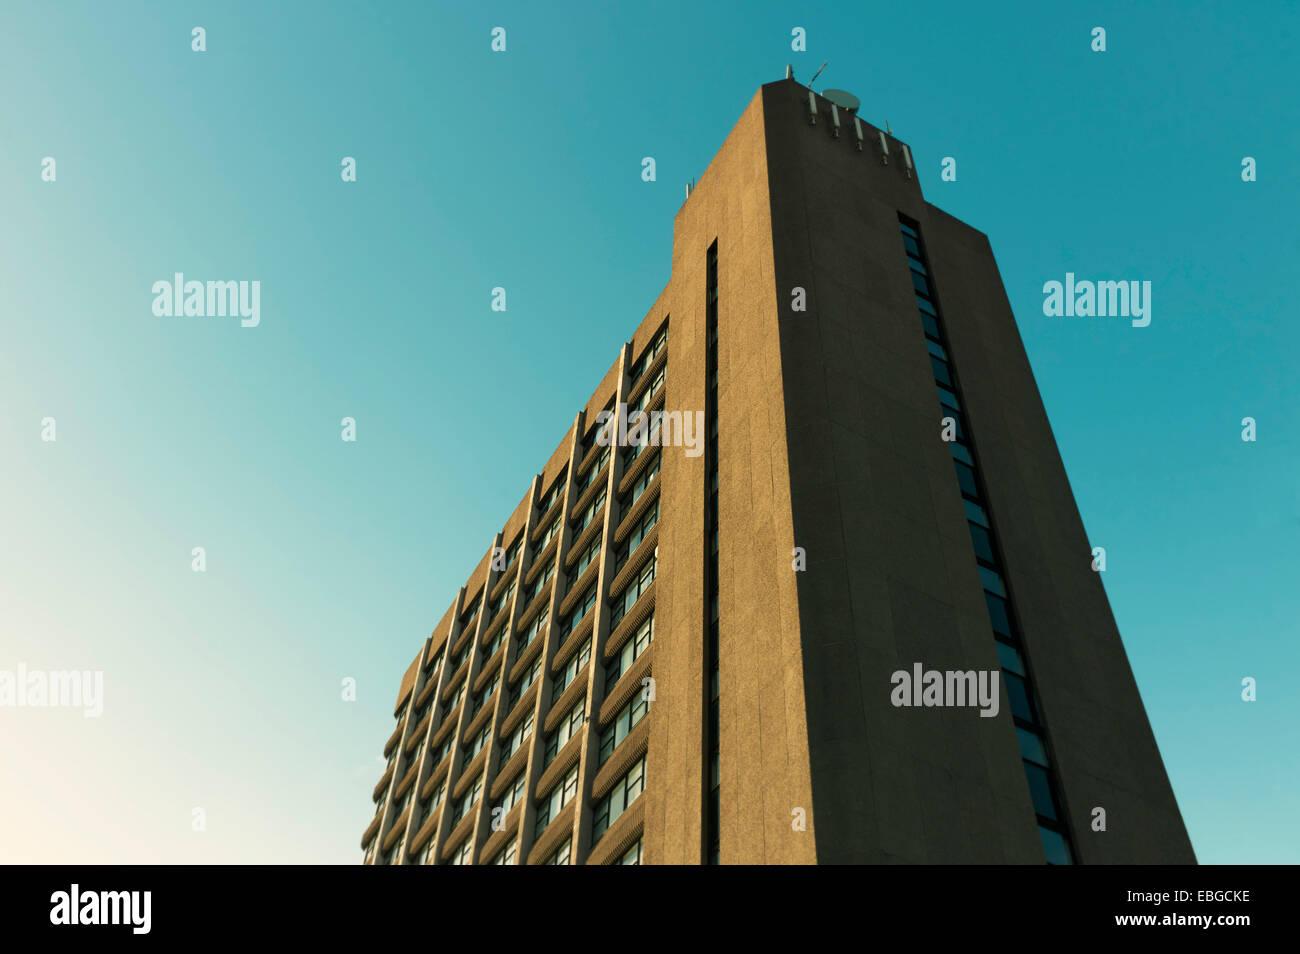 60s tower edificio de oficinas Imagen De Stock